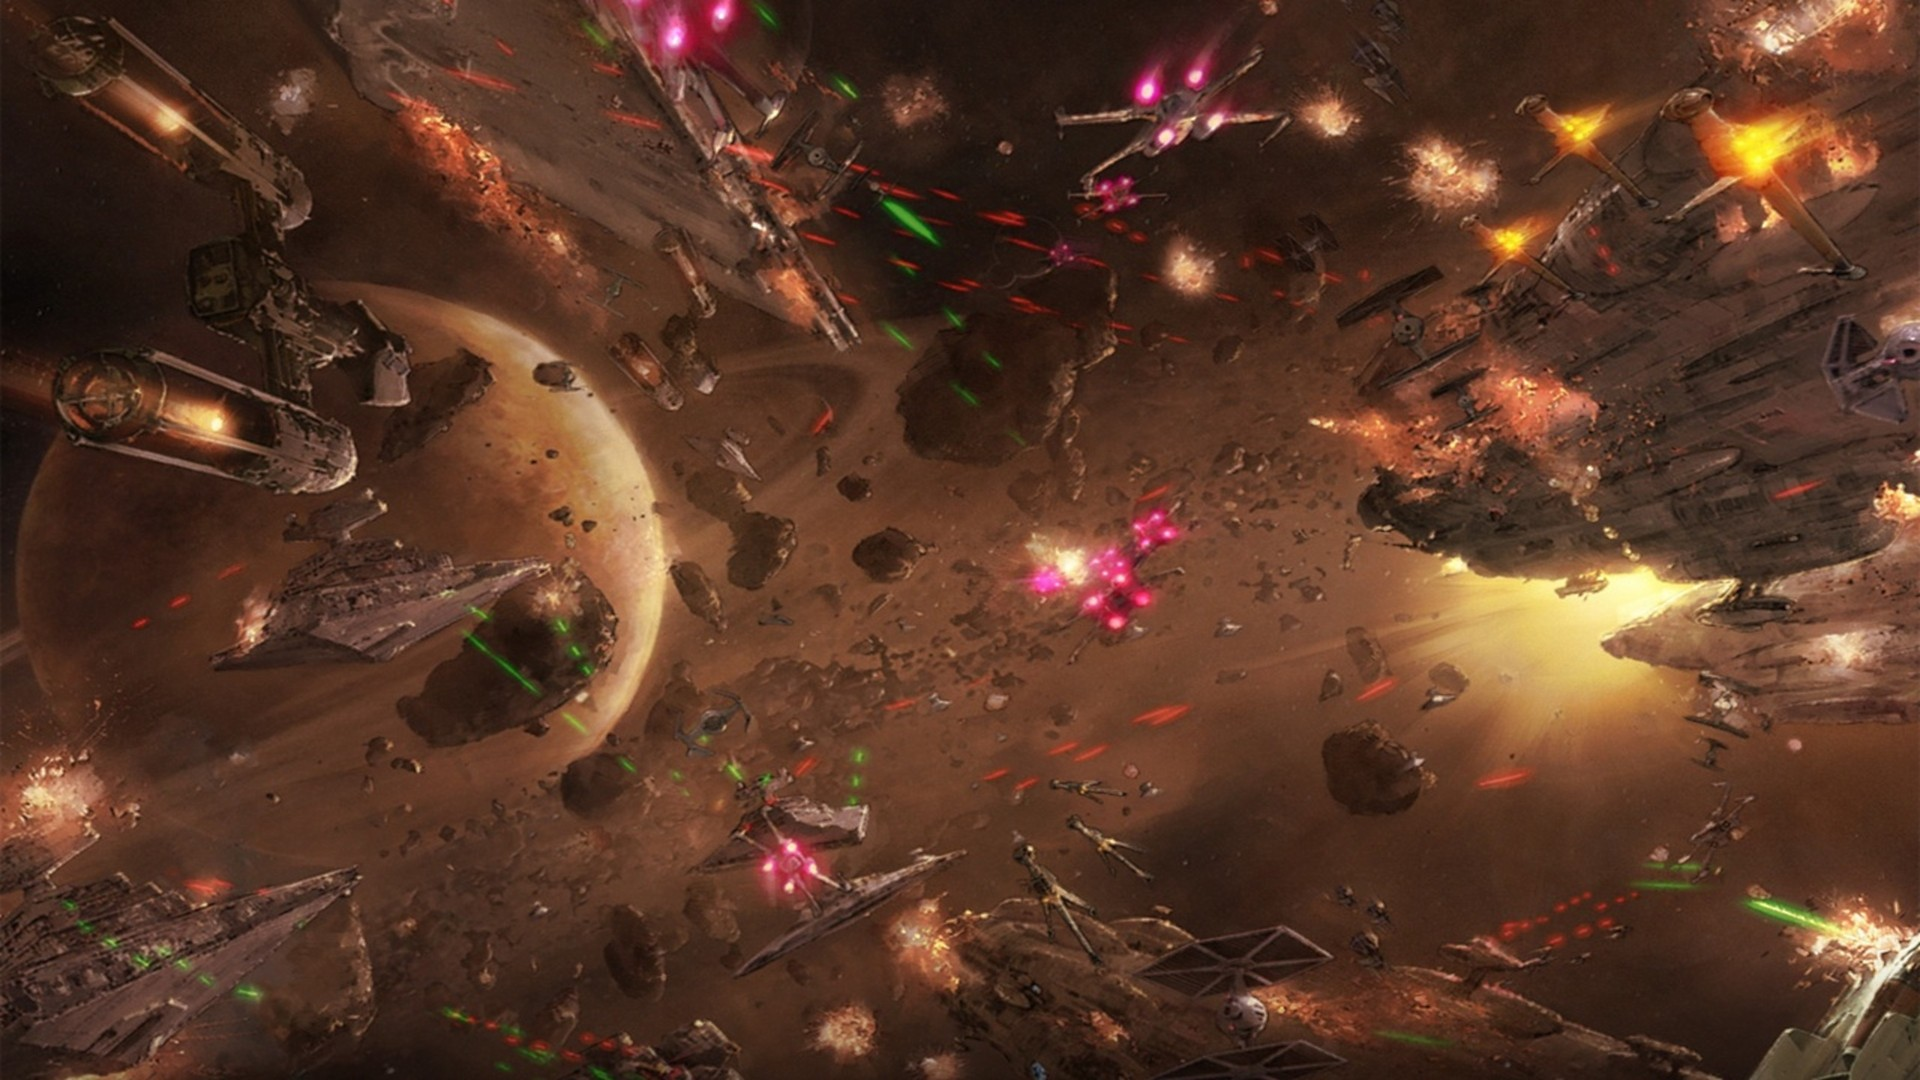 Star Wars Planet Wallpaper Hd Space Battle Of Geonosis 1920x1080 Wallpaper Teahub Io